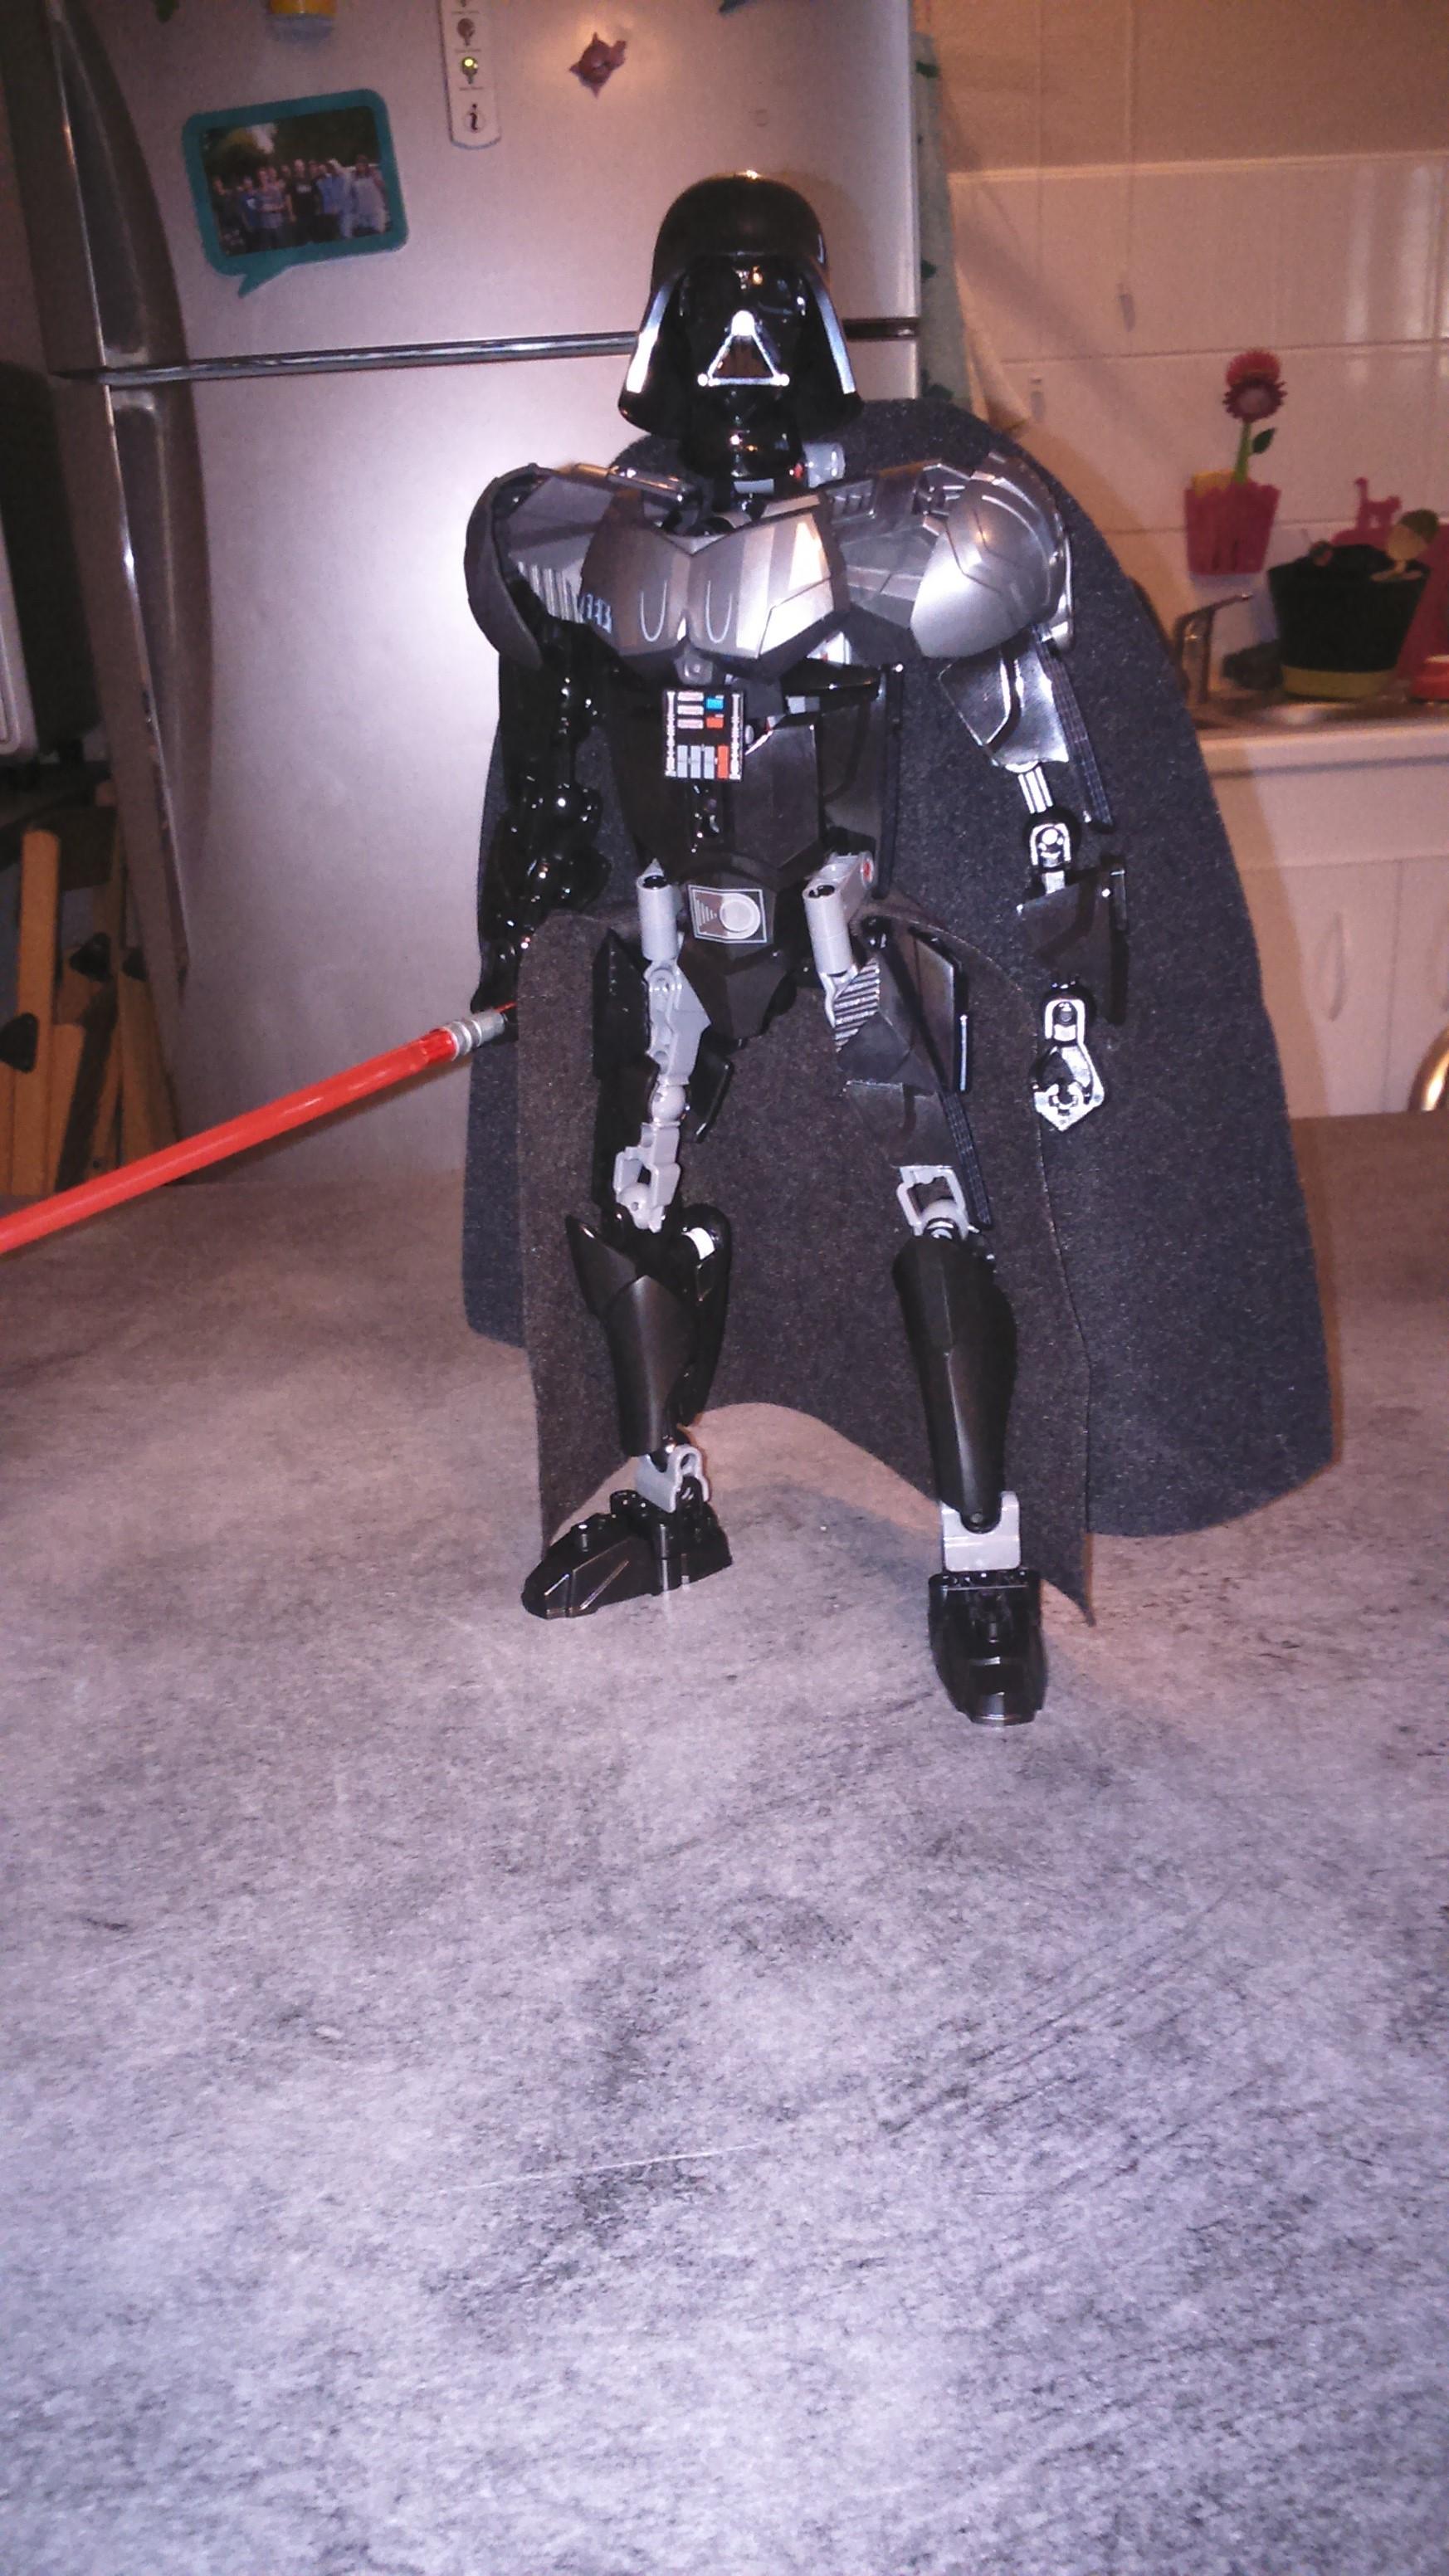 [Revue] Figurine à construire LEGO Star Wars 75111 : Dark Vador  1441562978-dsc-0025